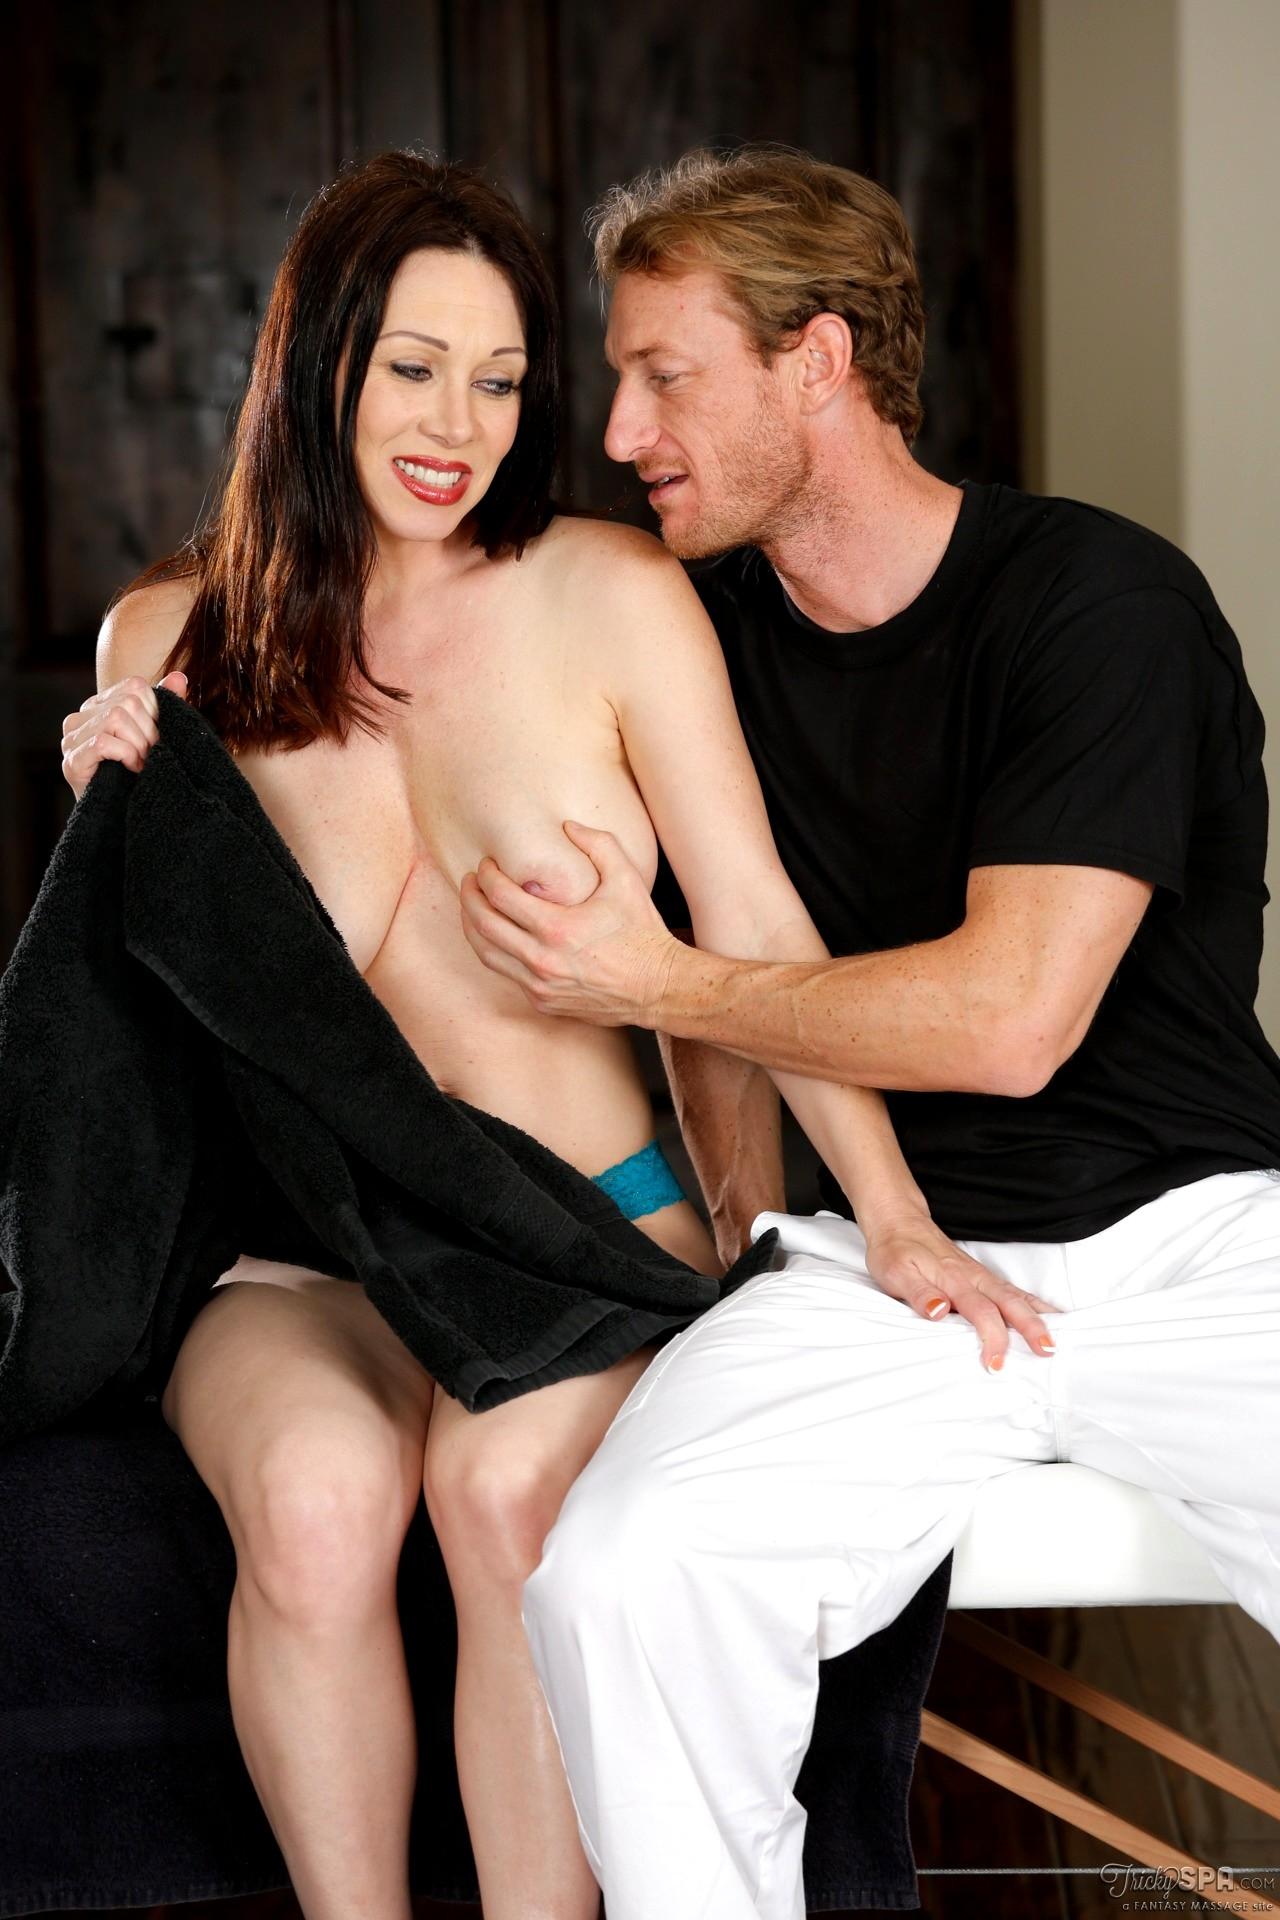 Naughty Family. japanese tricky massage